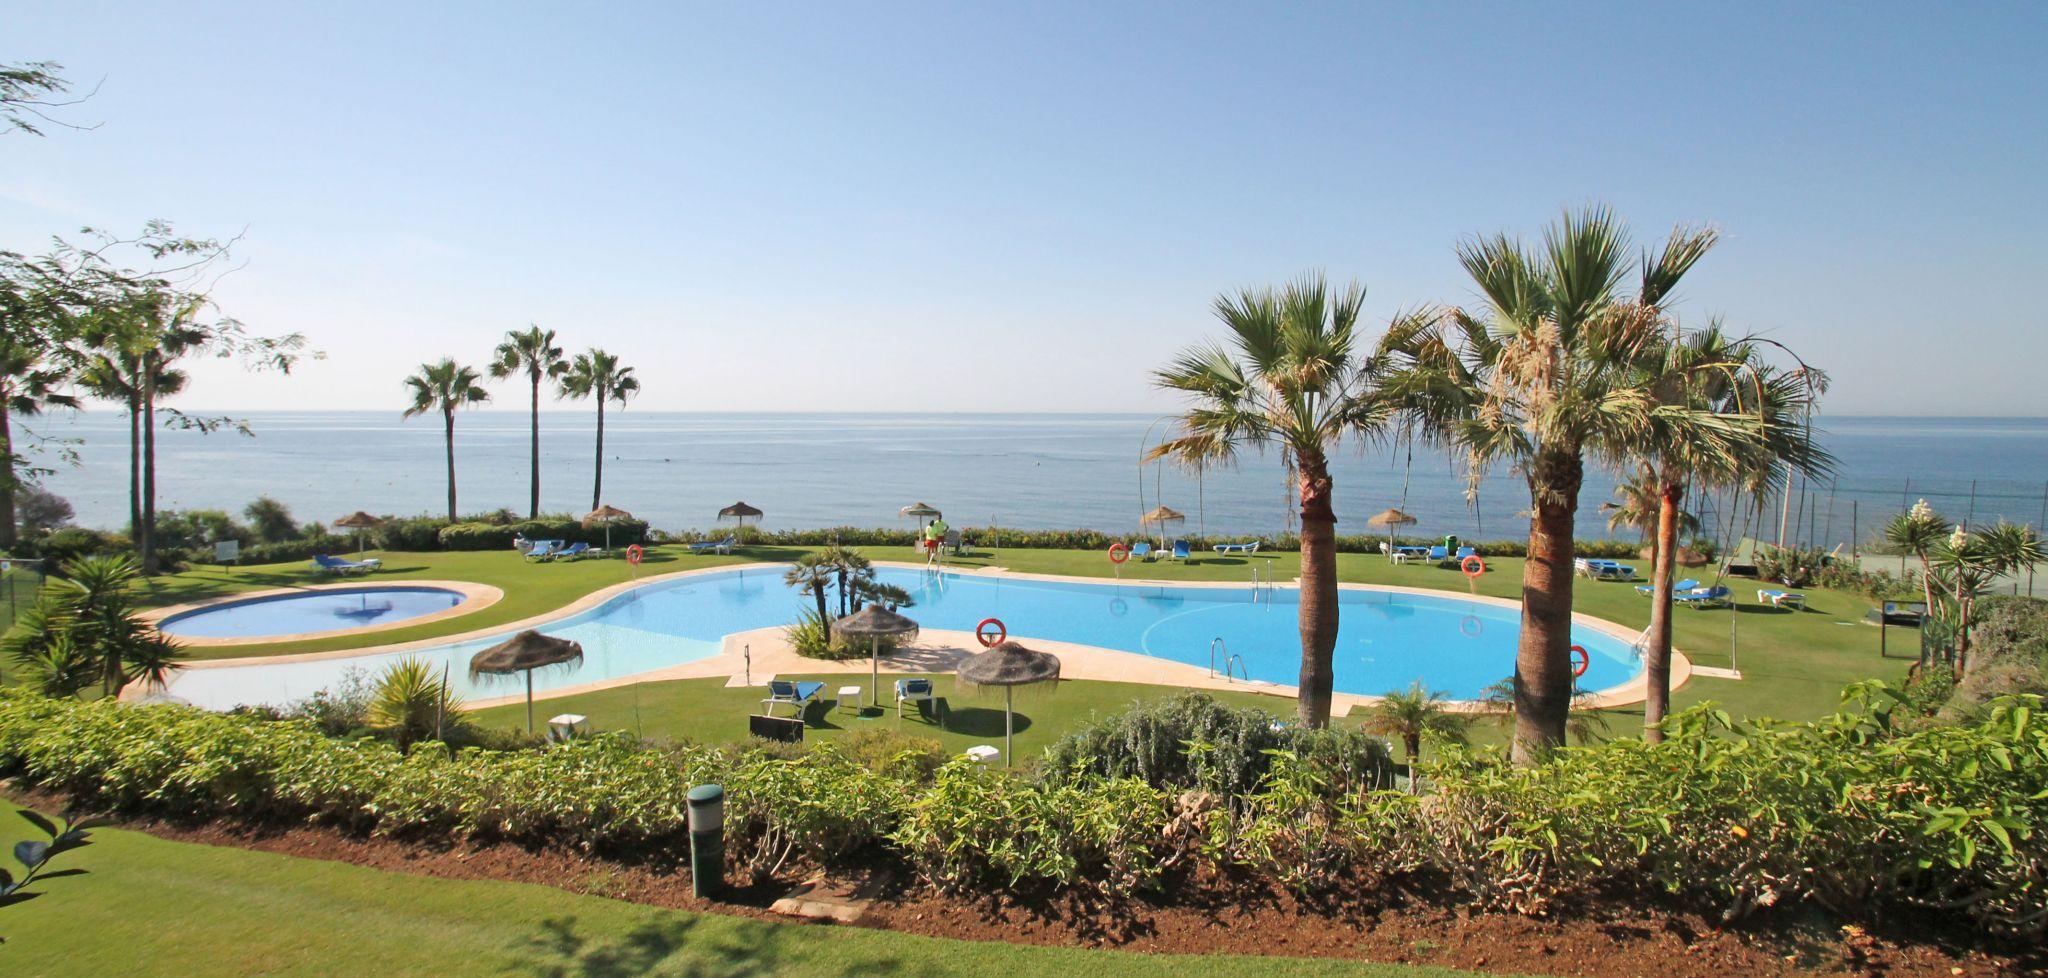 Beachfront three bedroom apartment in Cabopino, Marbella